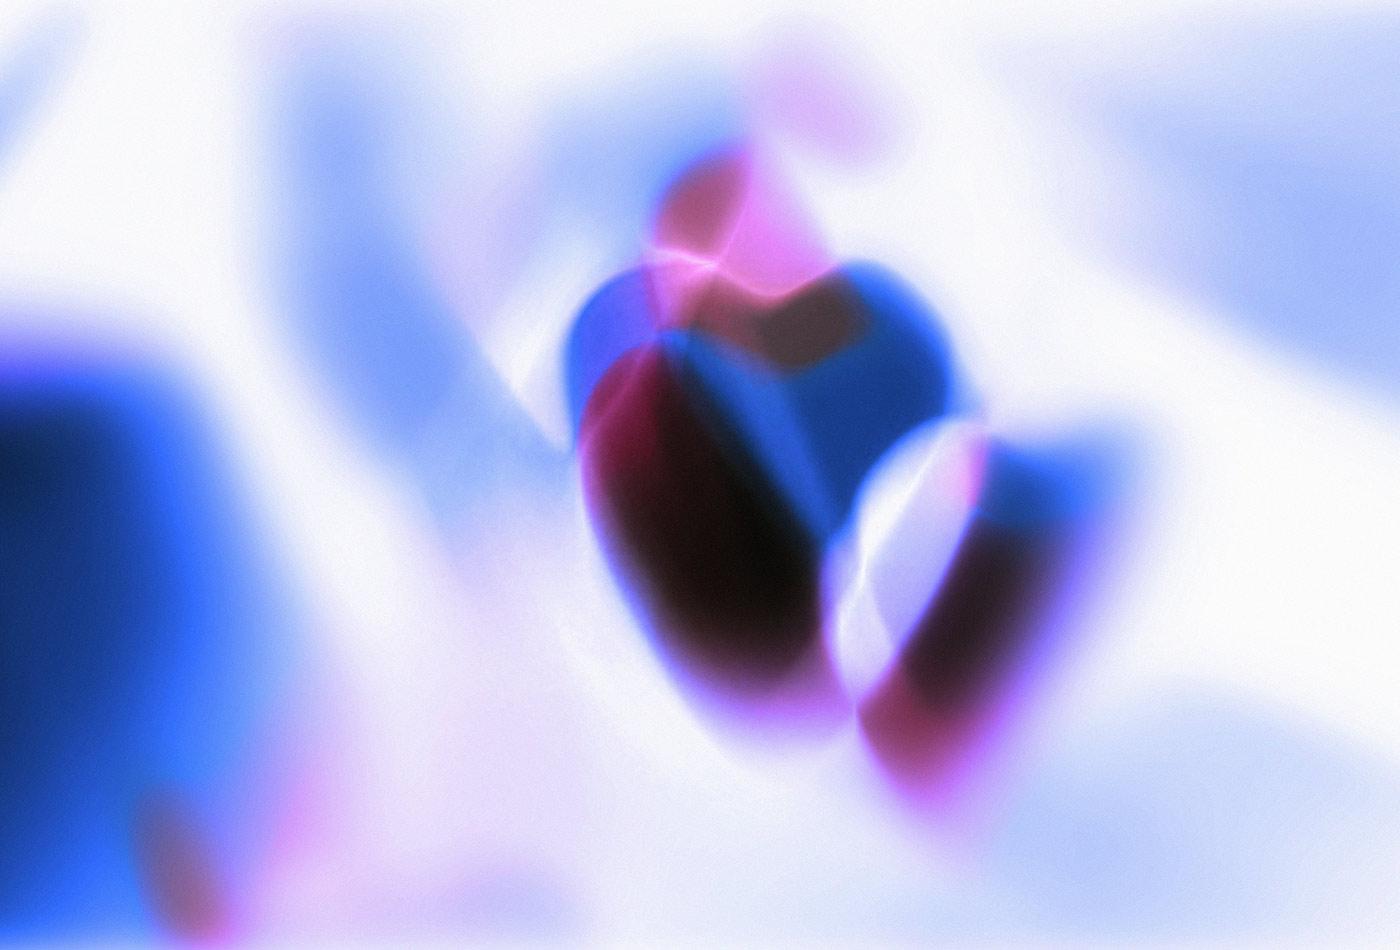 Heart in Throat X-Ray.